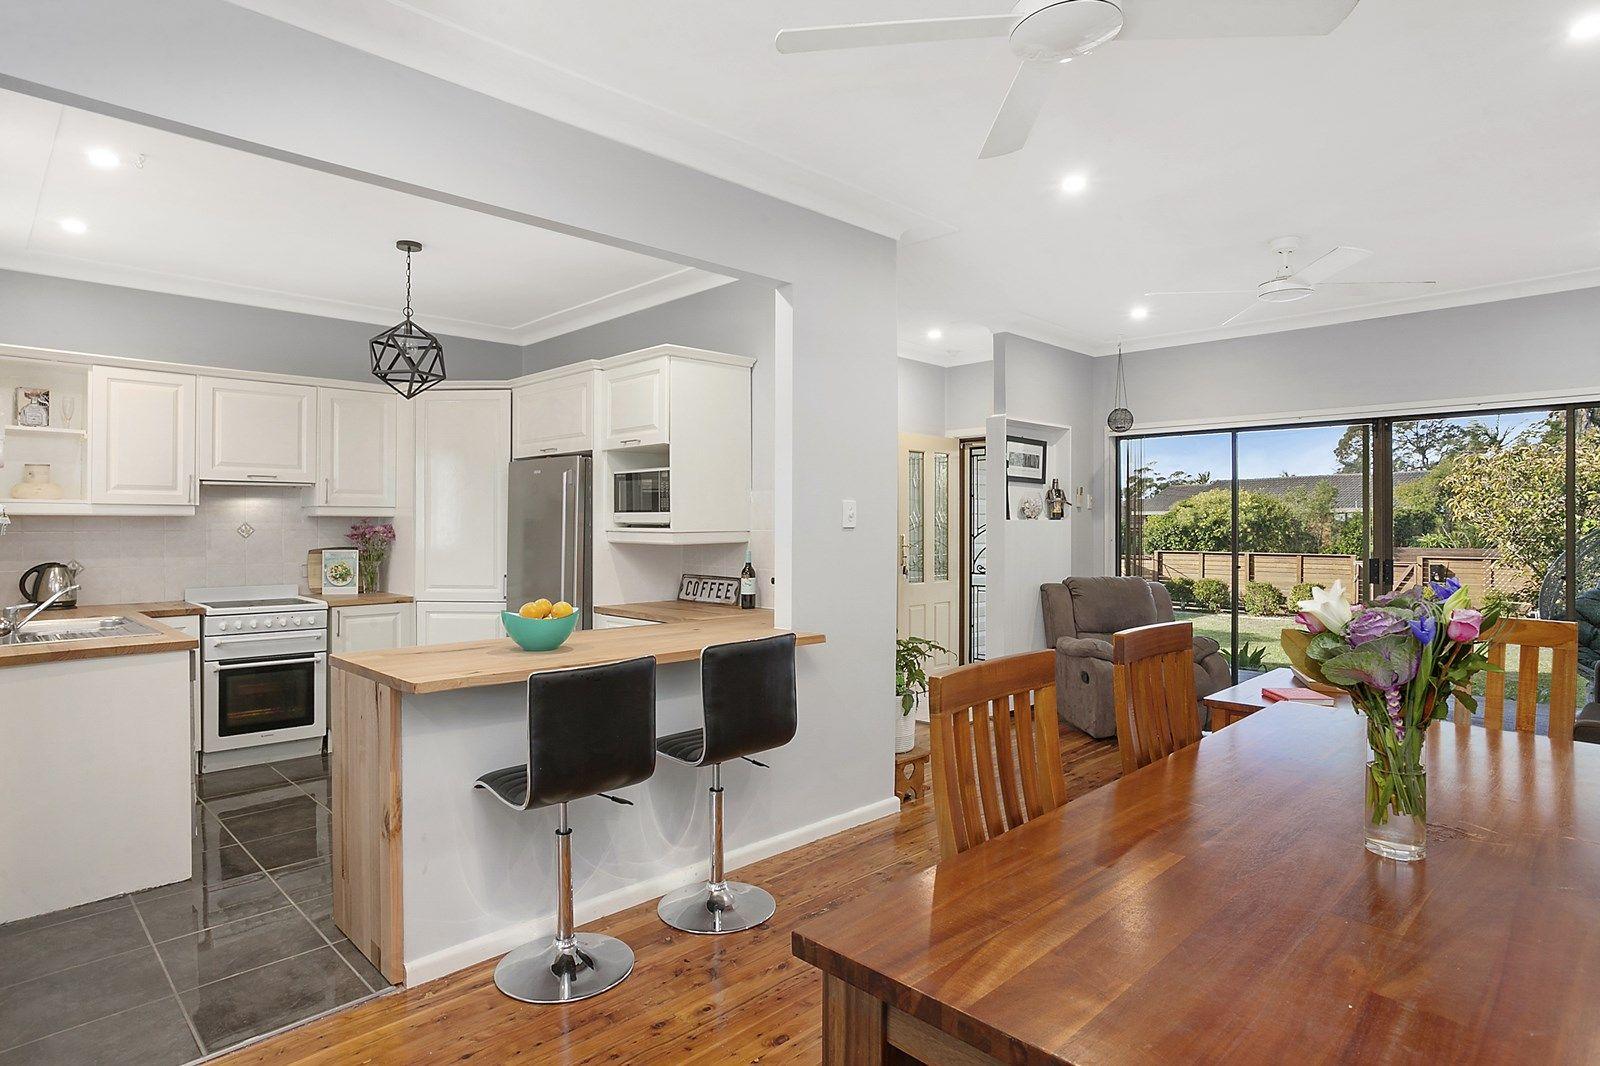 173 Cooriengah Heights Road, Engadine NSW 2233, Image 2